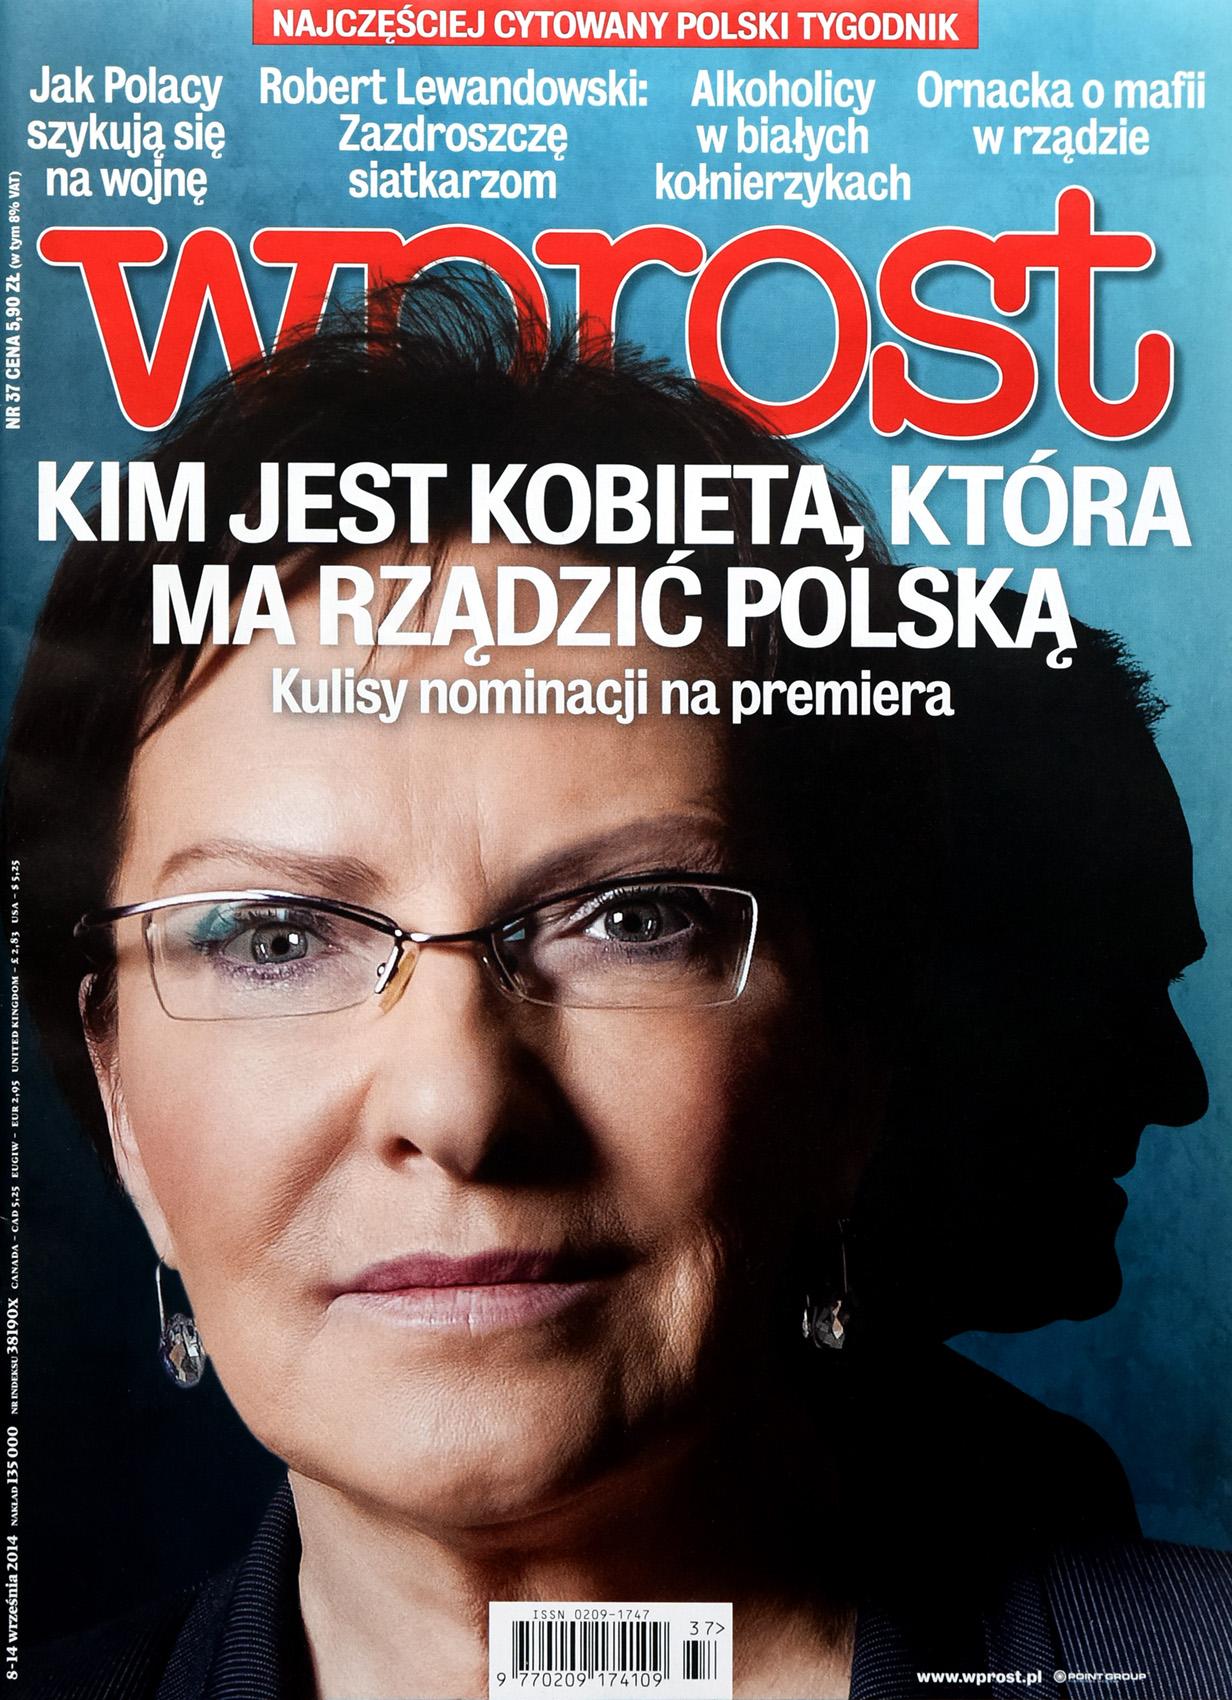 WPROST nr 37/2014 - okładka - Donald Tusk